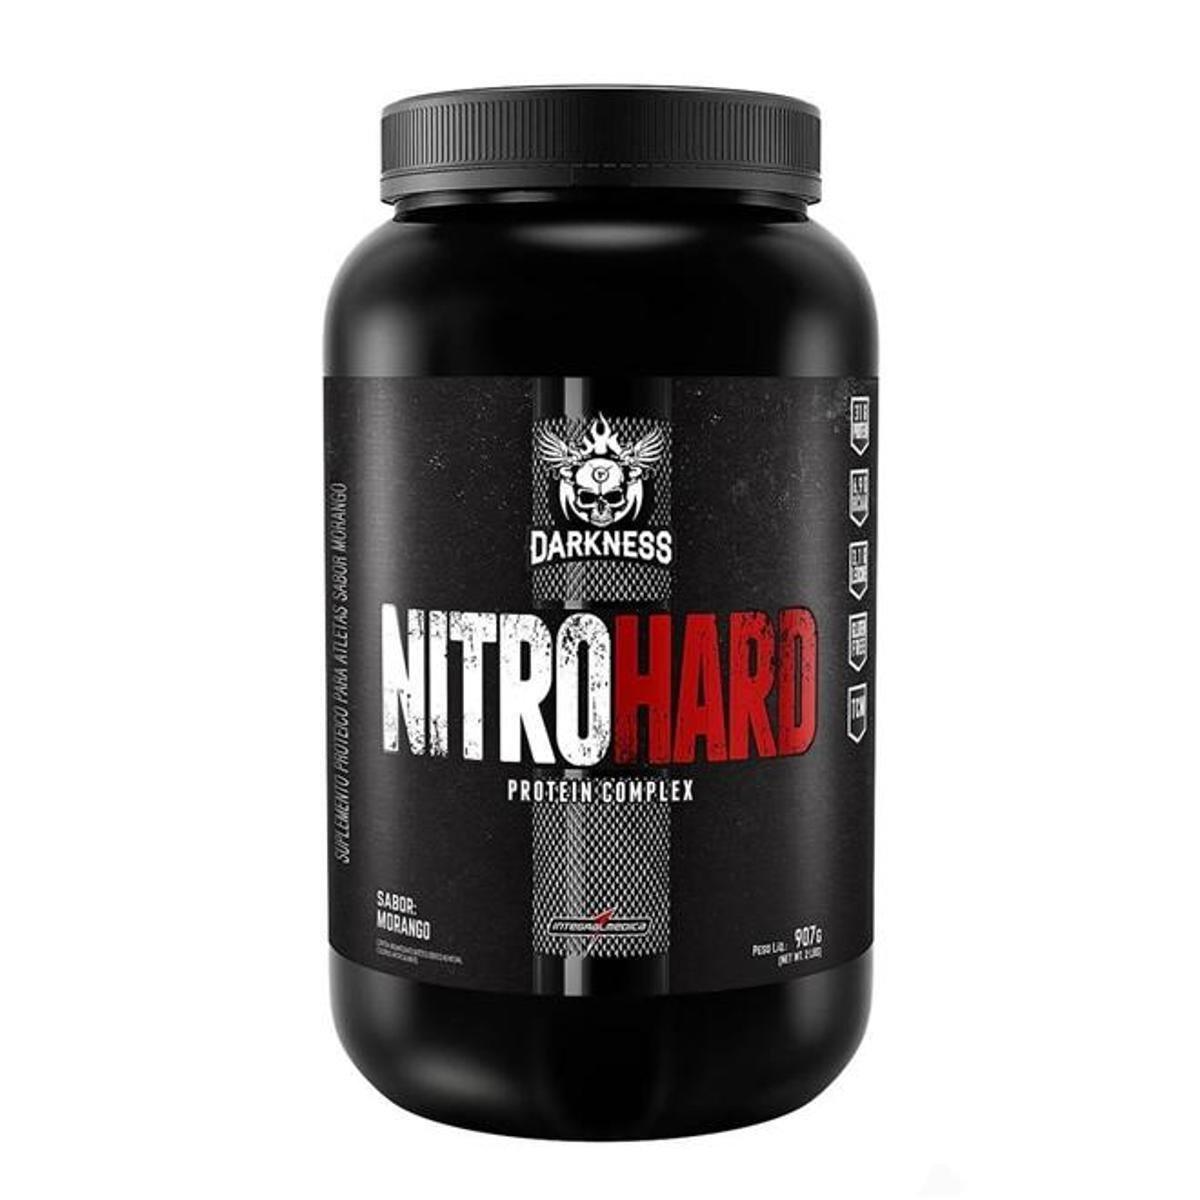 Nitrohard 907g - Darkness